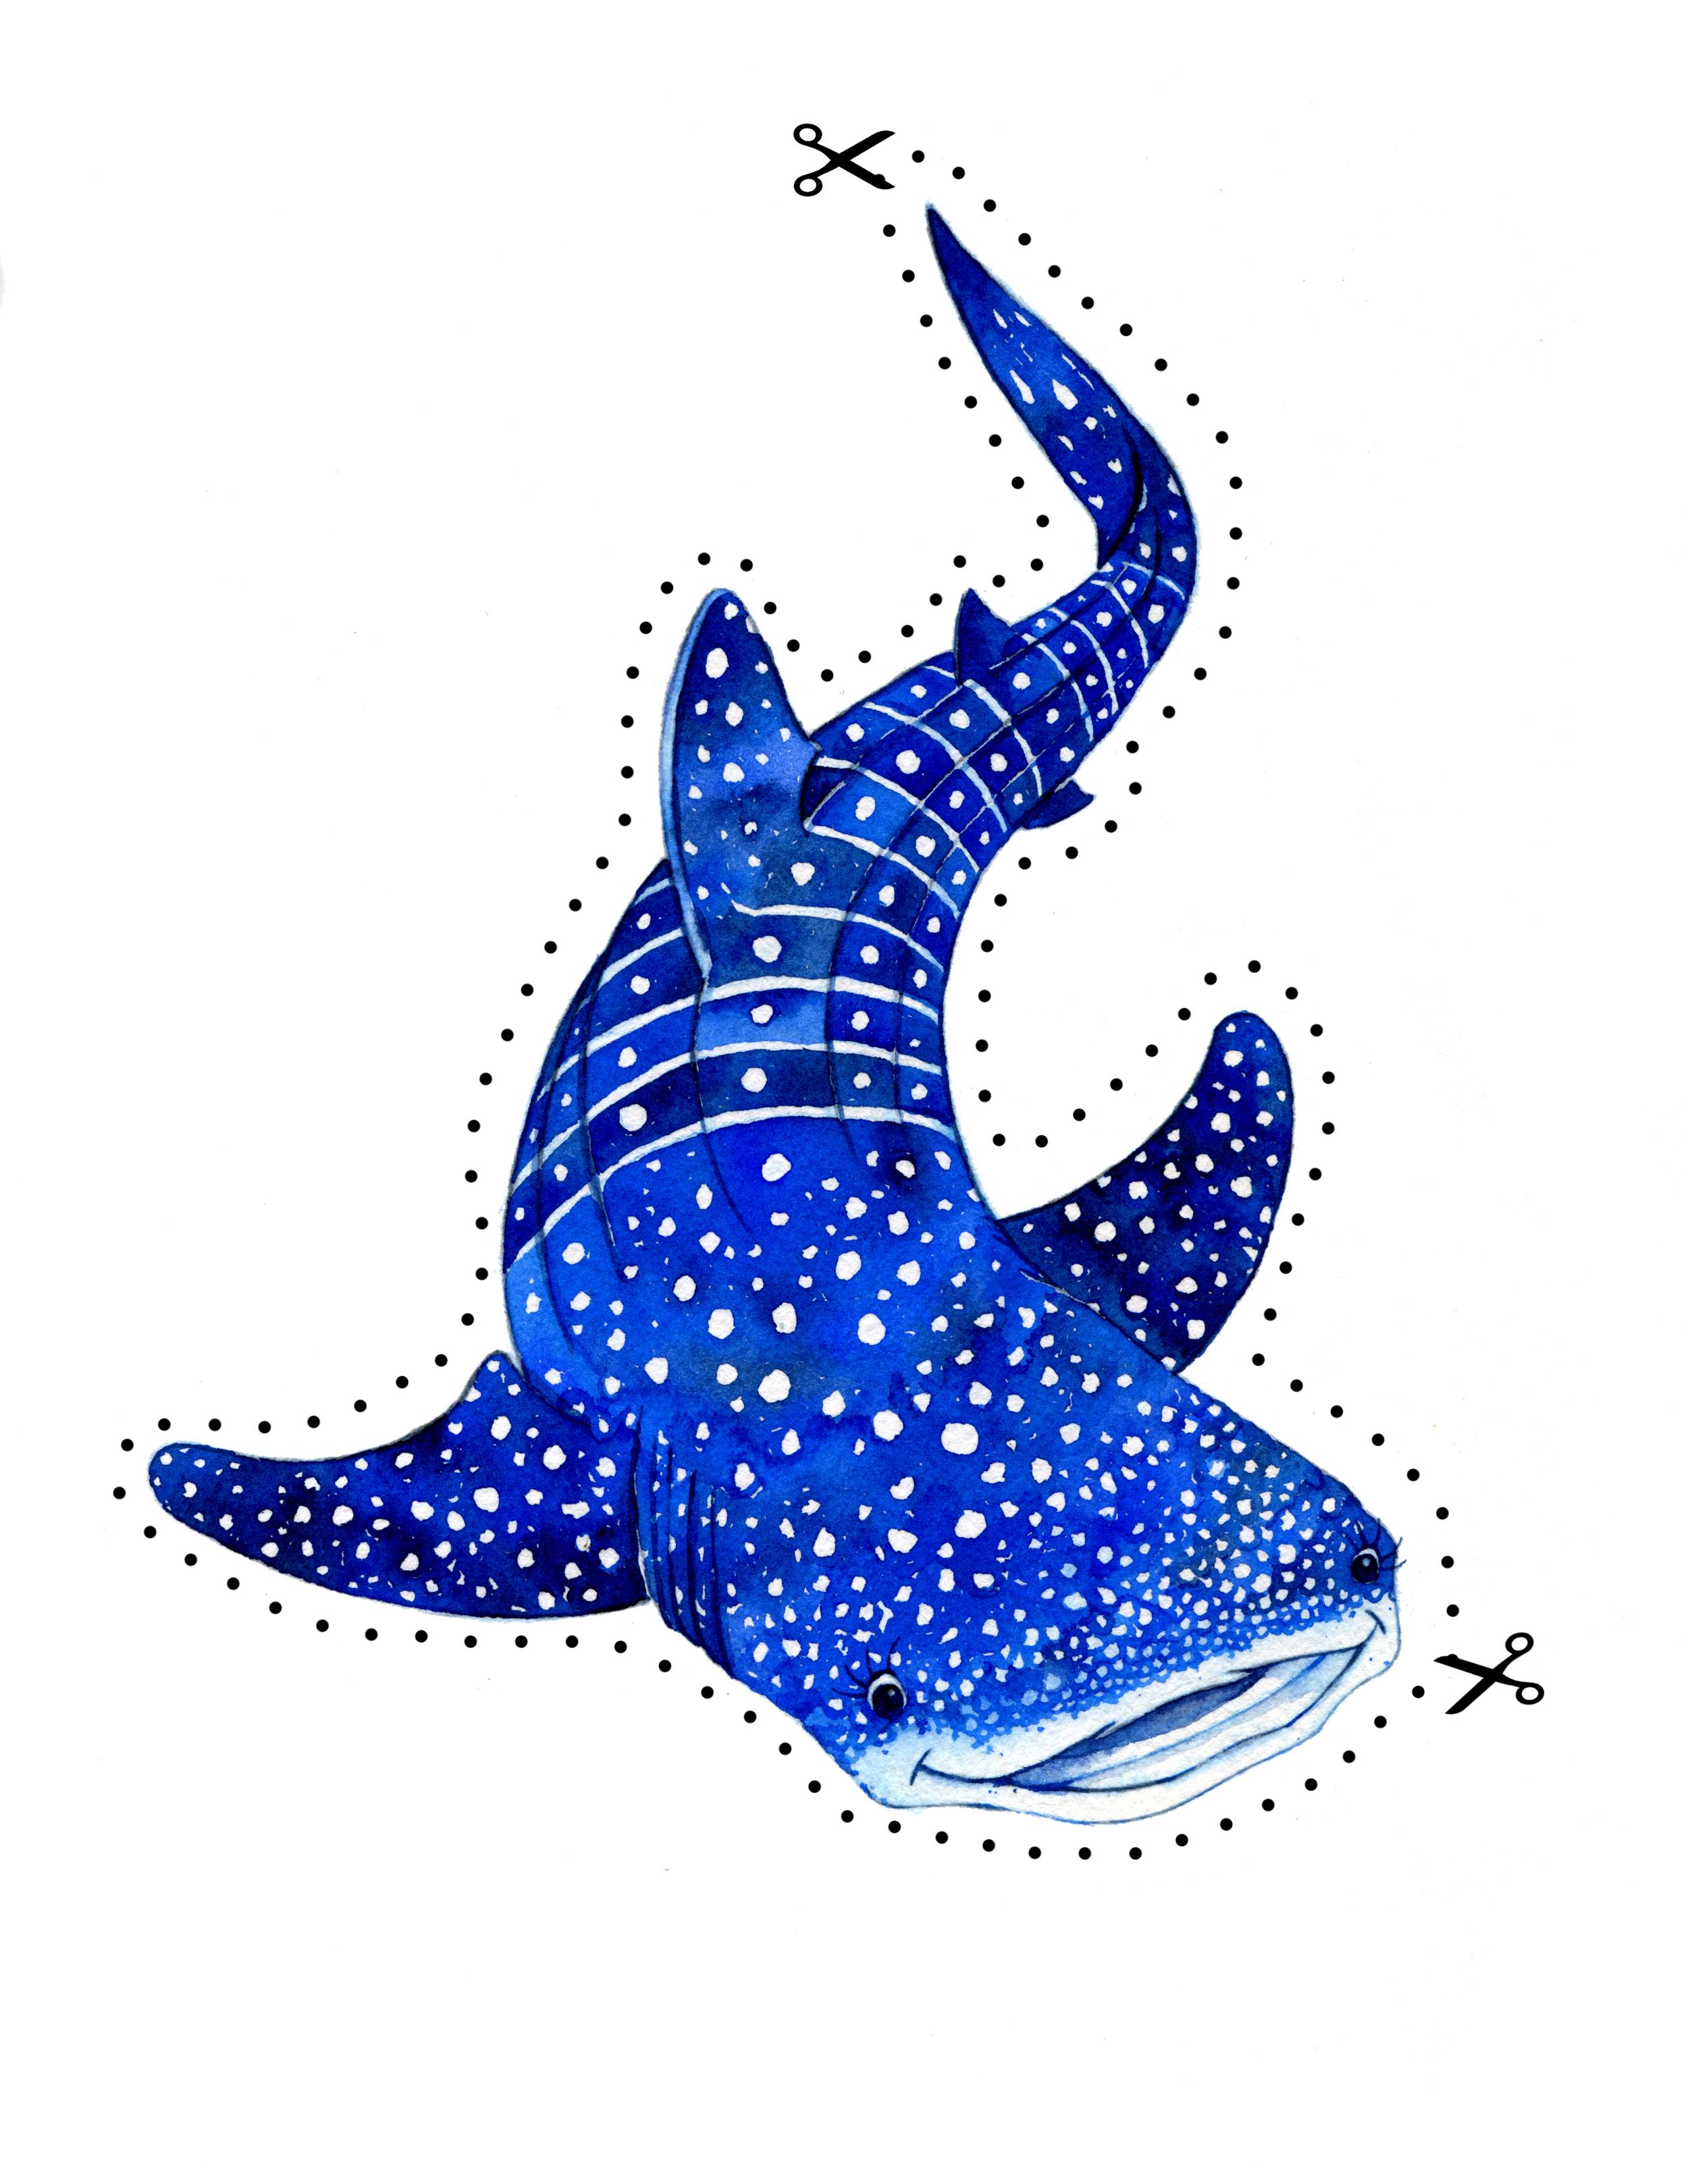 Ballena the Whale Shark